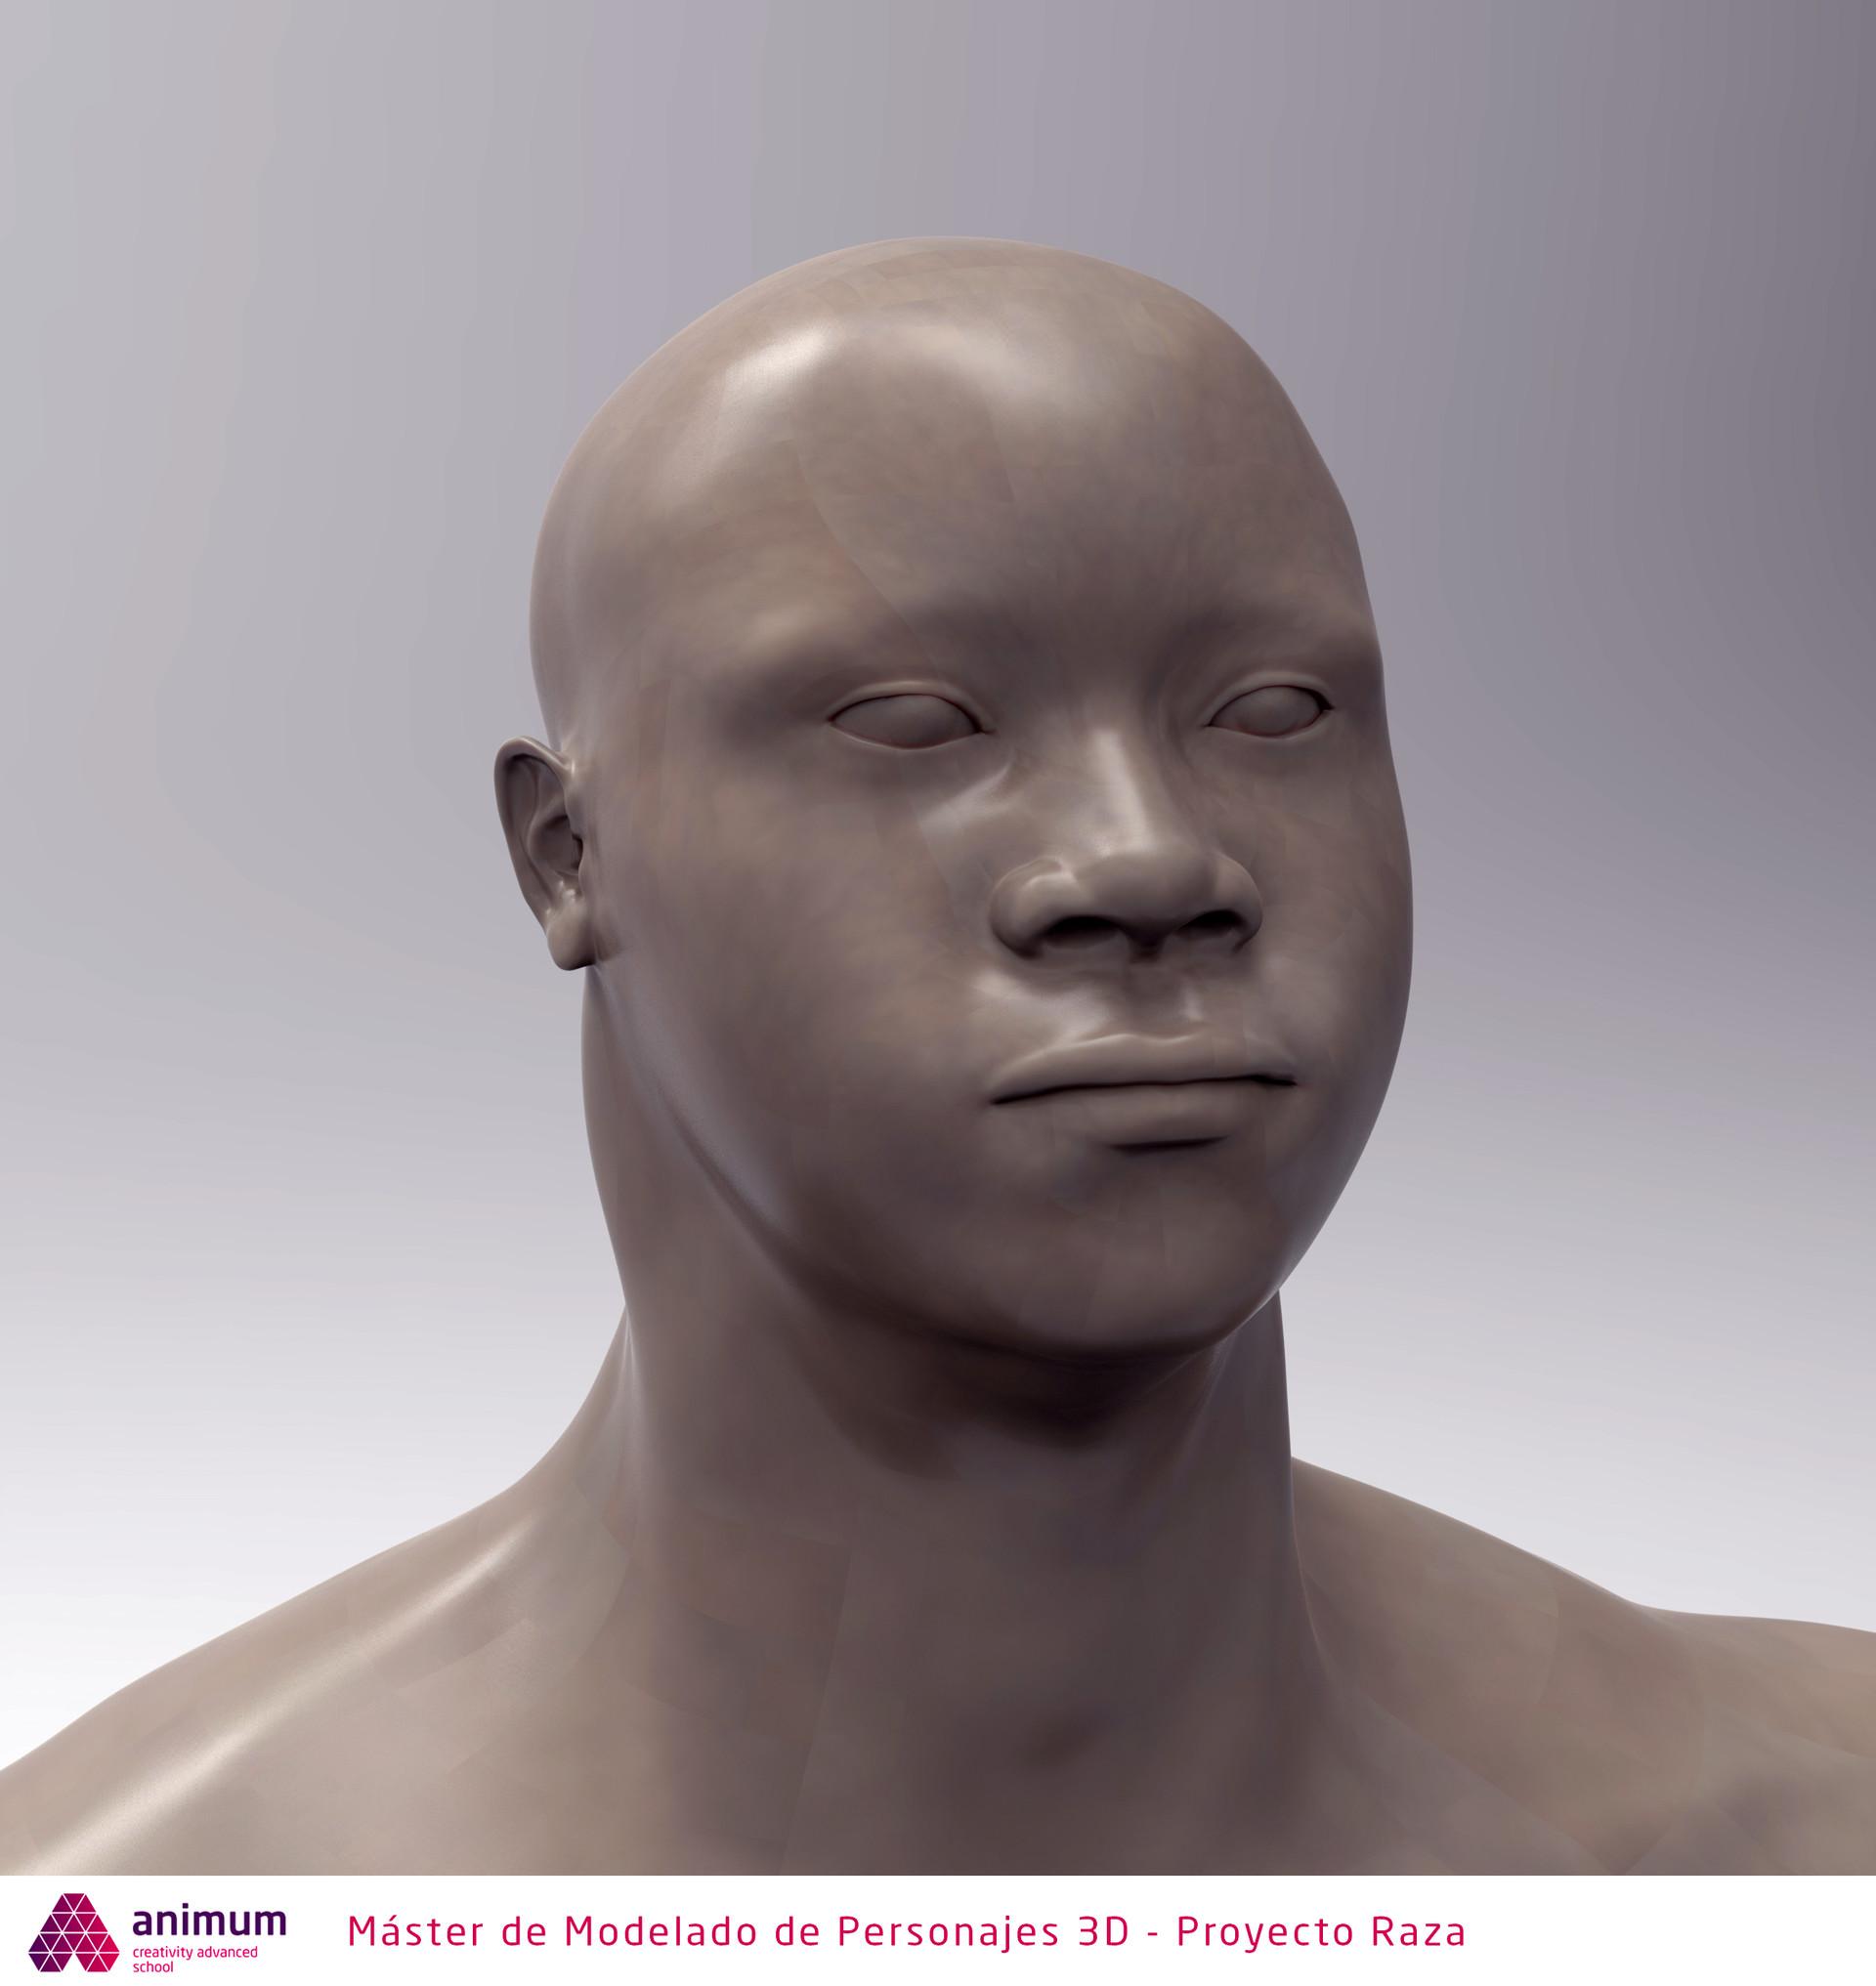 Eusebio hb africano